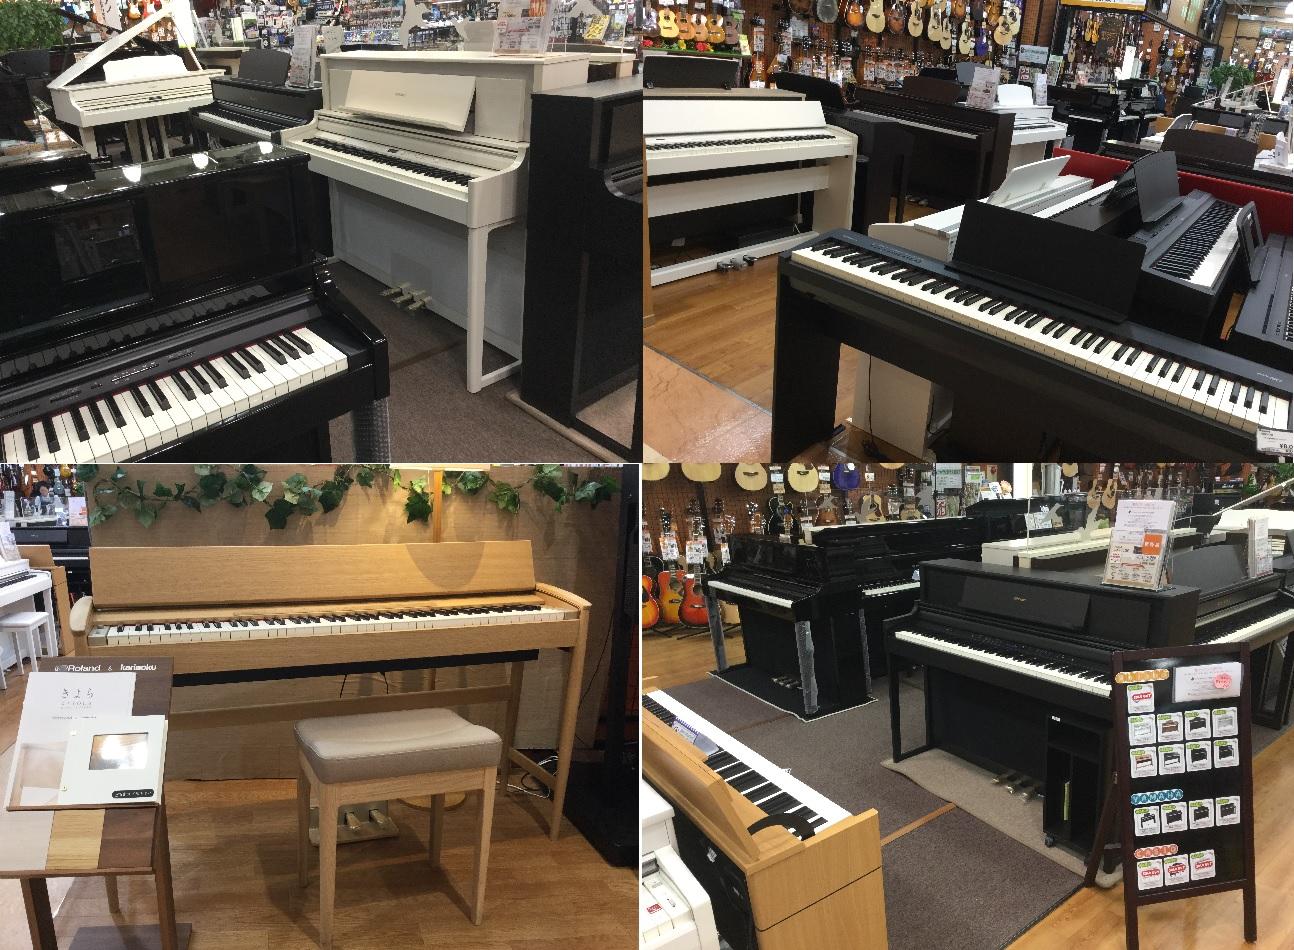 電子ピアノ 利府 宮城 仙台 島村楽器